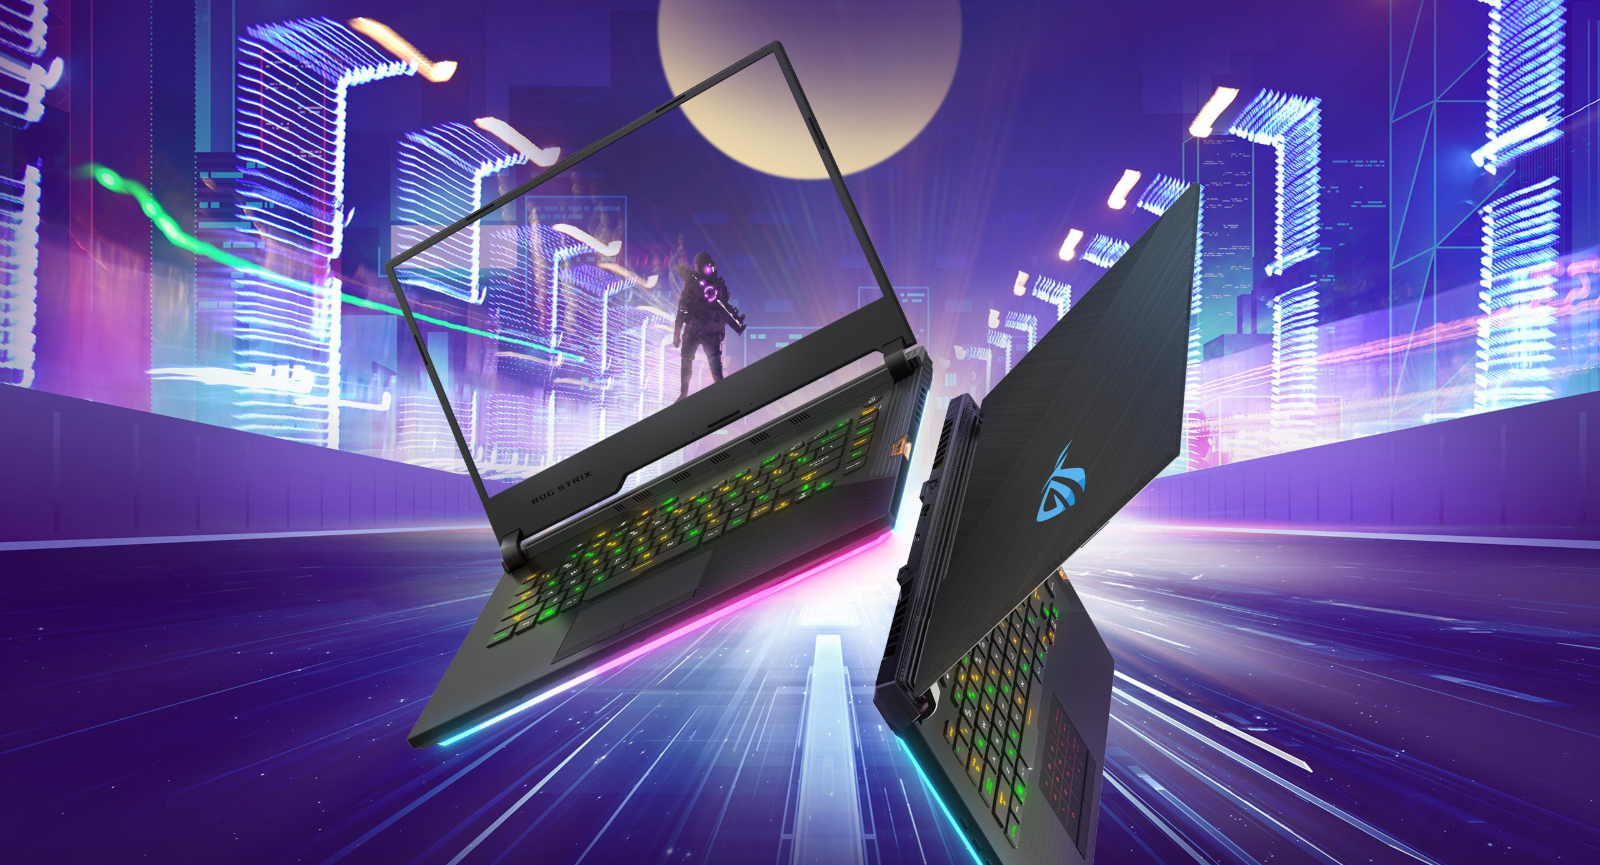 9th Gen ASUS ROG Strix SCAR III GL531GV - RTX 2060 ( I7-9750H / 16GB /  512GB SSD ) 15 6'' WITH 144Hz GAMING LAPTOP *COMEX PROMO*